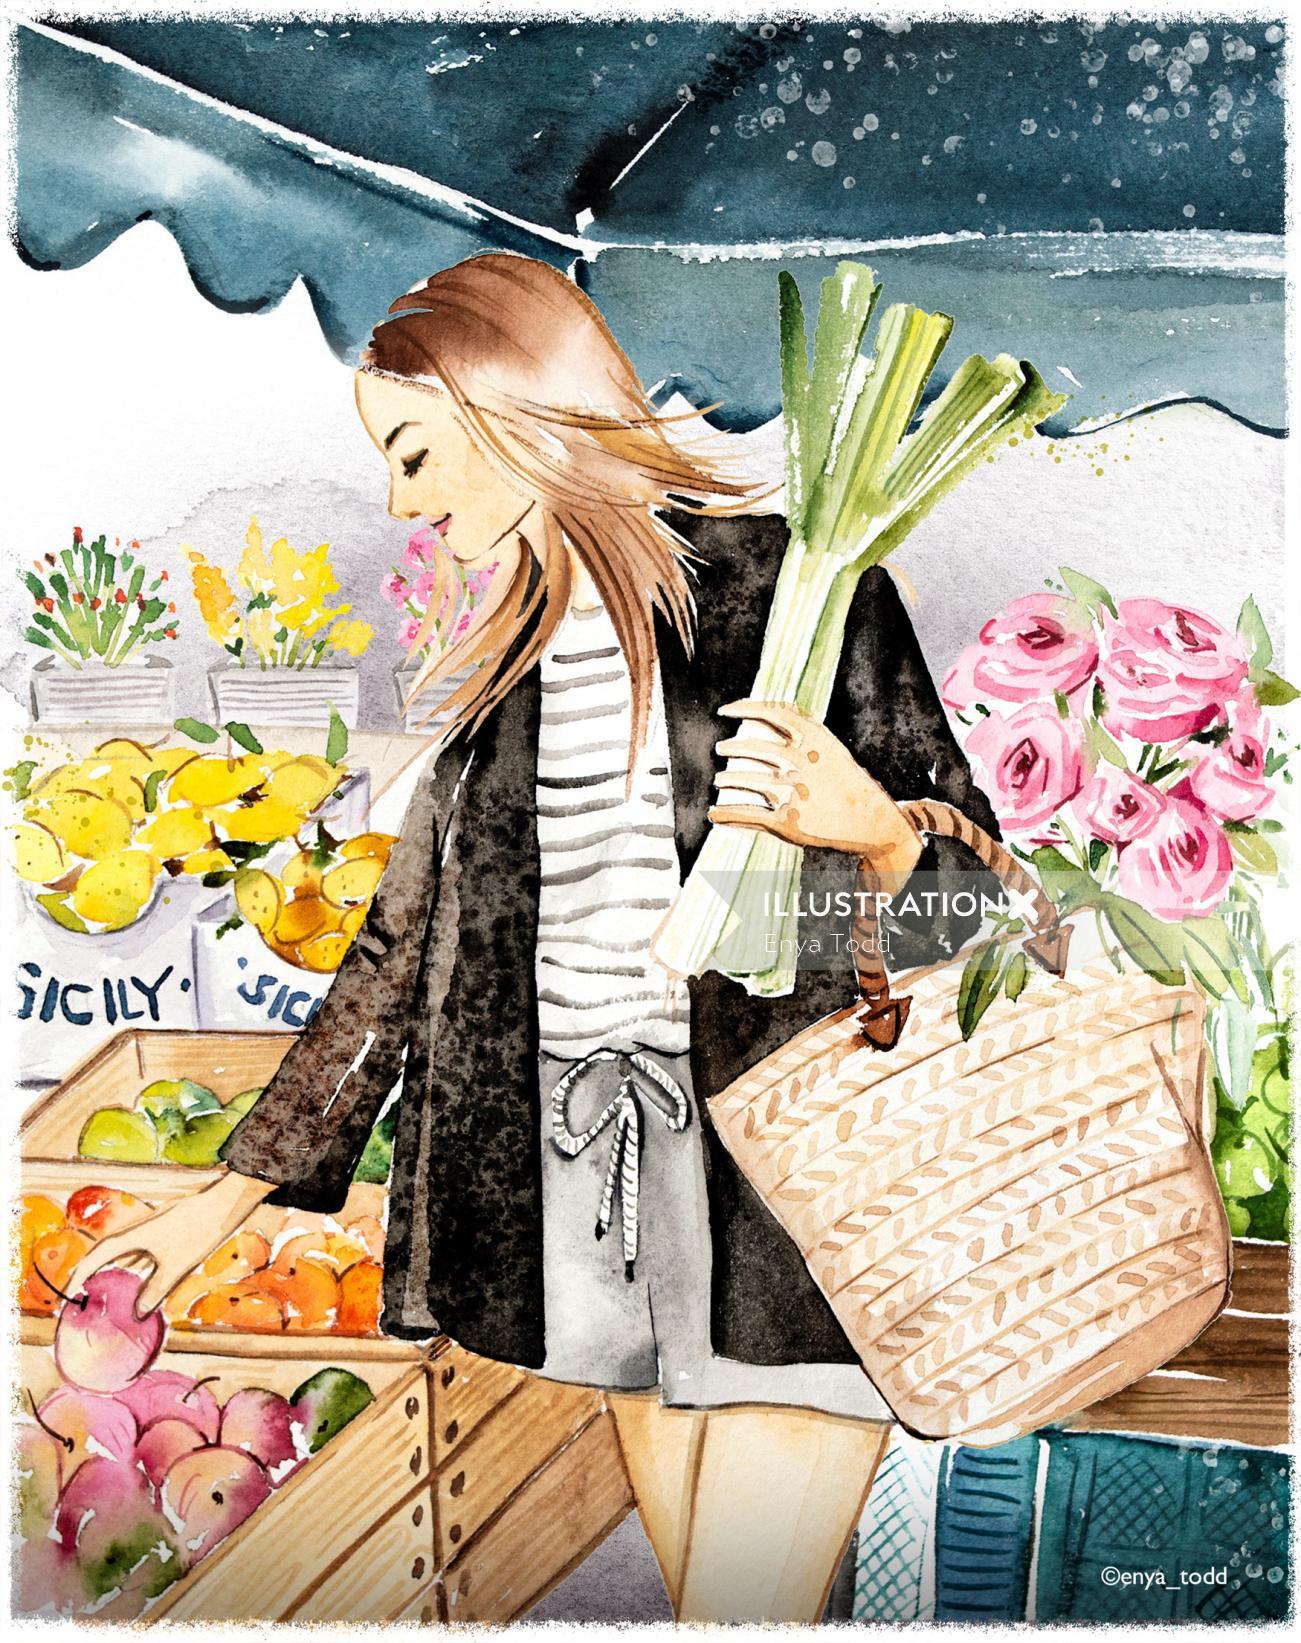 Watercolor Sunday farmer's market